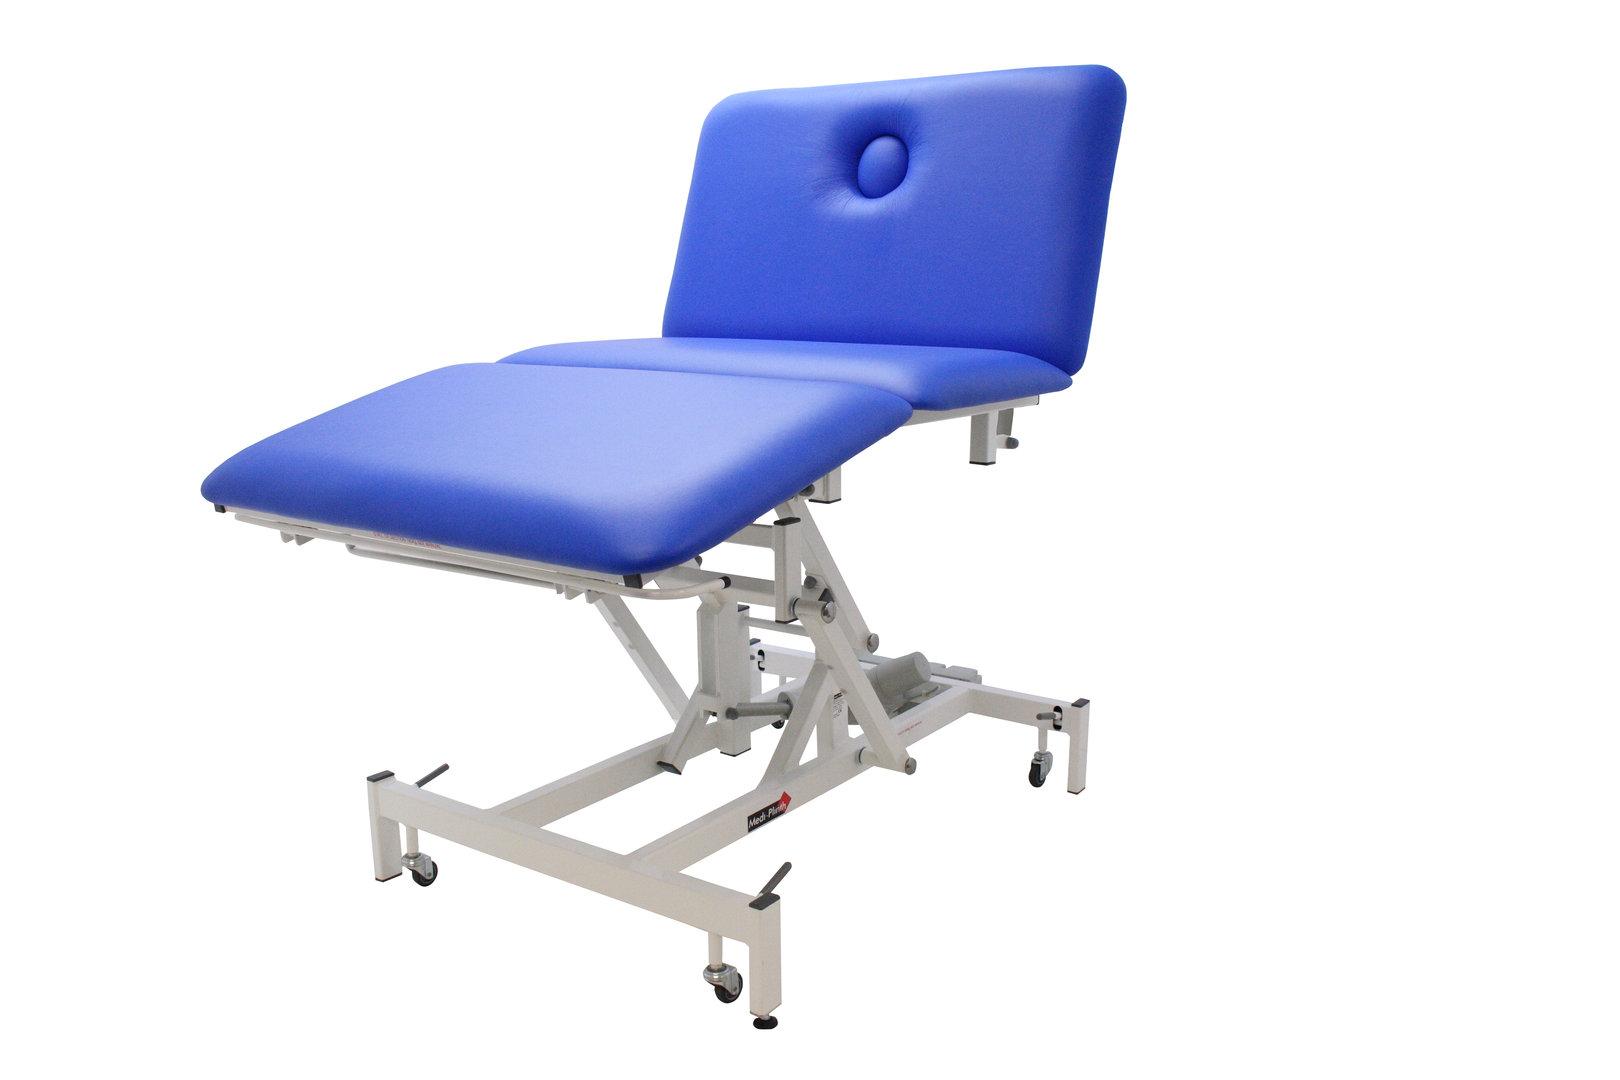 Medi-Plinth 3 Section Bariatric Bo Plinth Electric | Medical Supermarket